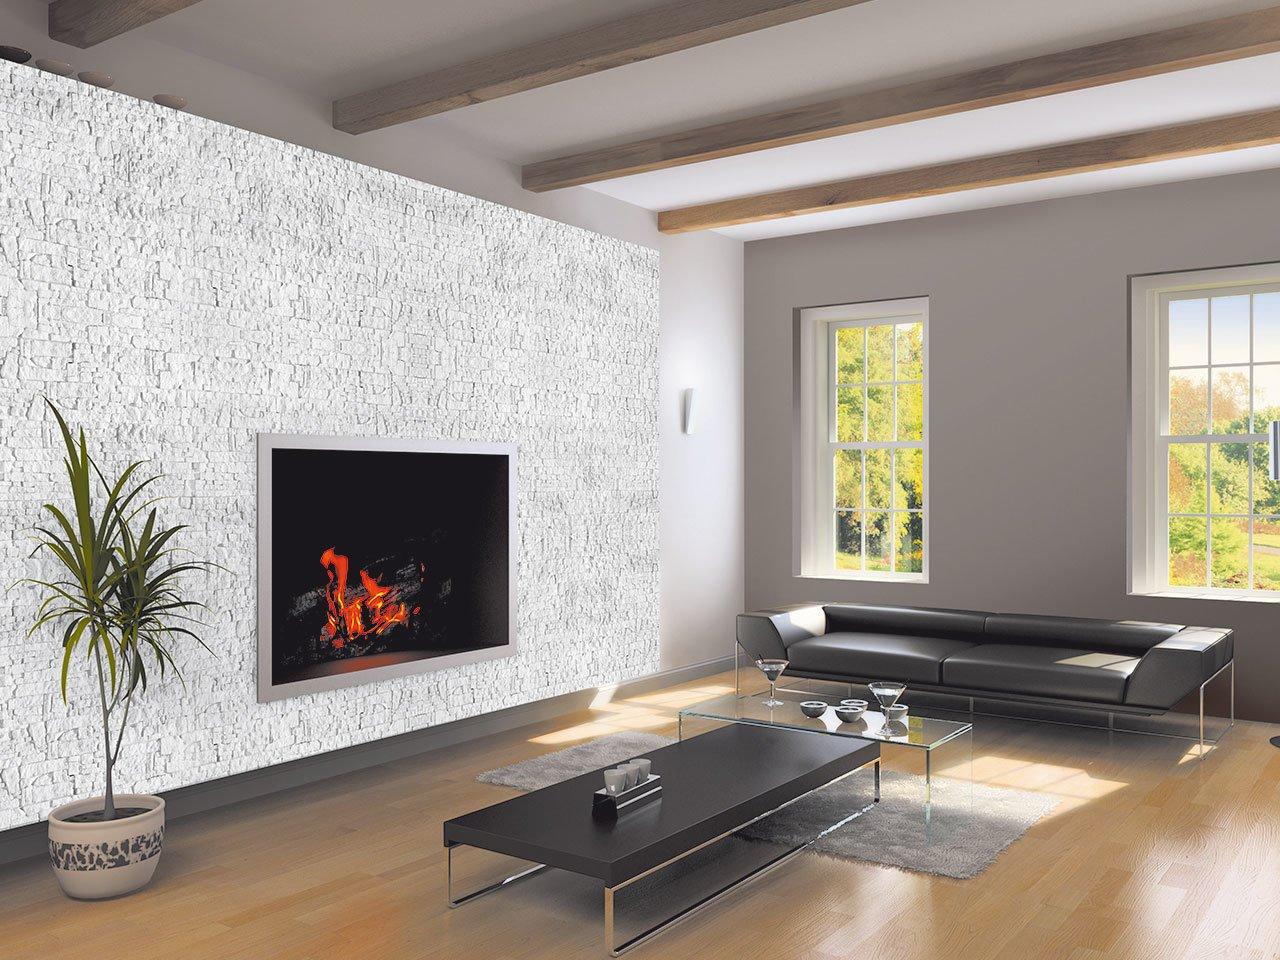 Chamonix bianco int iperceramica for Immagini per pareti interne